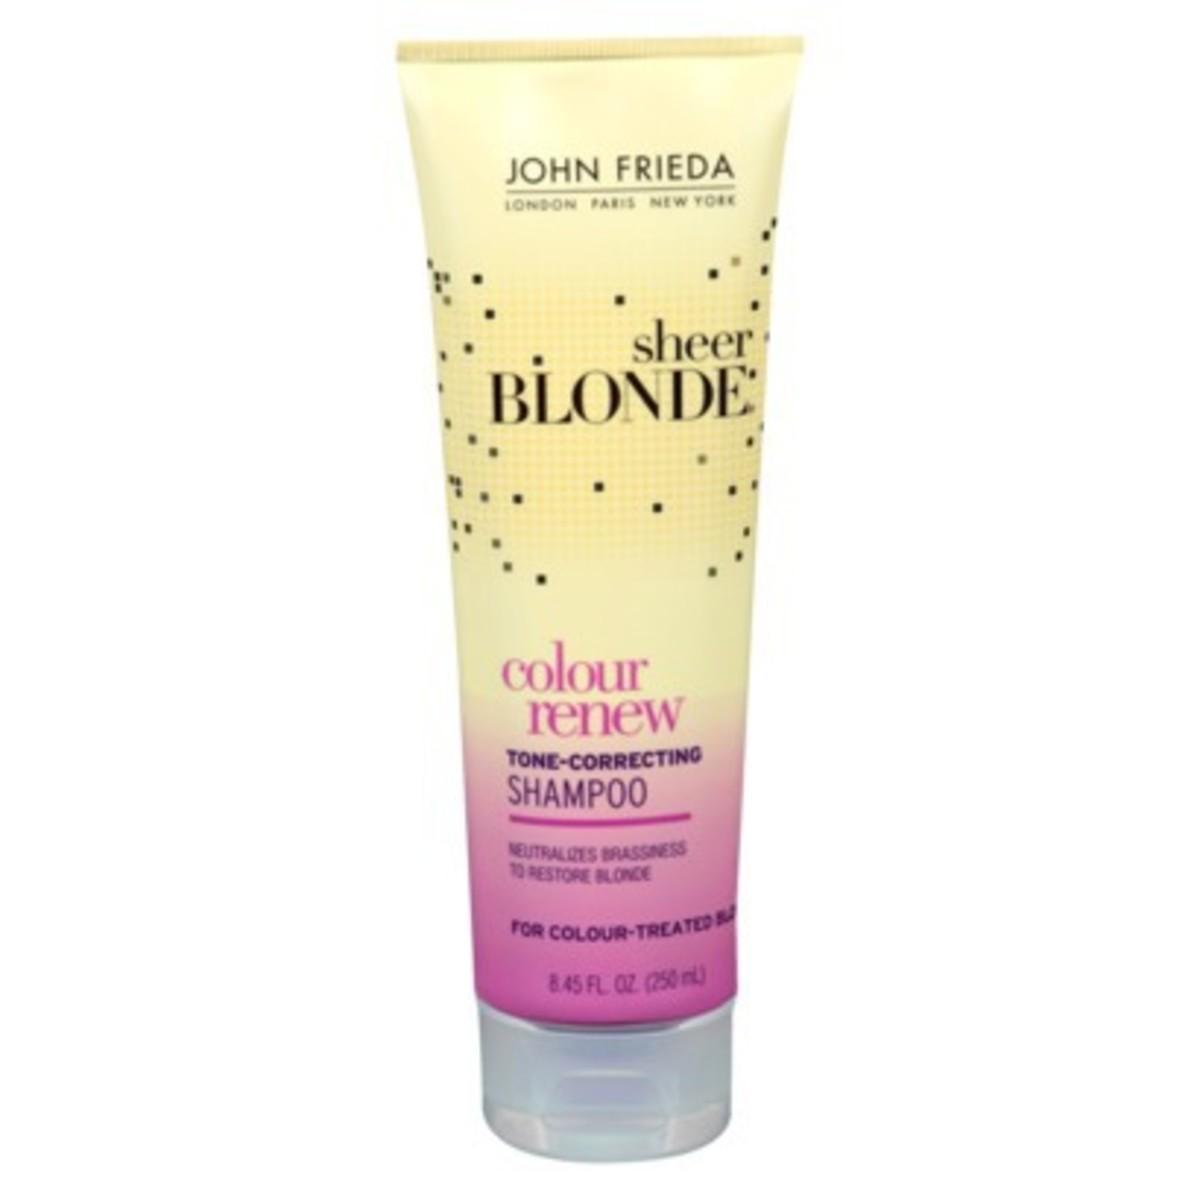 John Frieda Sheer Blonde Colour Renew Tone-Correcting Shampoo